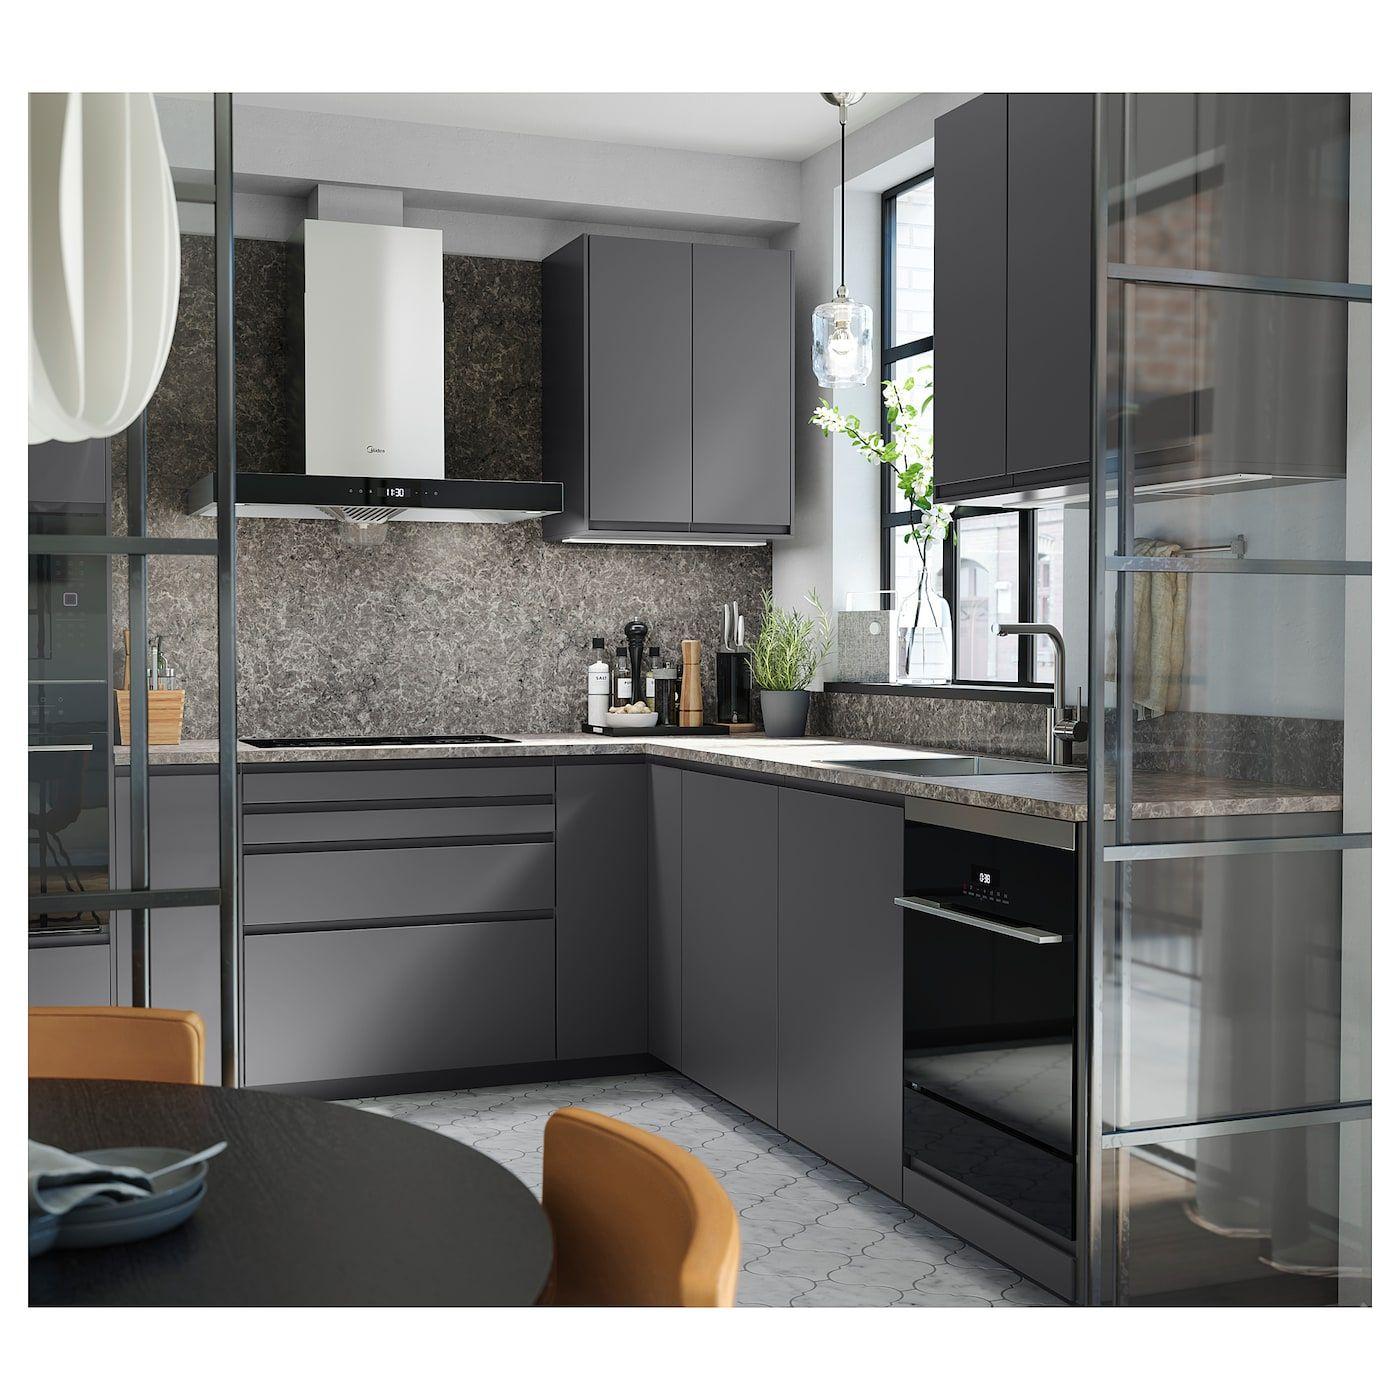 Ekbacken Arbeitsplatte Dunkelgrau Marmoriert Laminat Marmormuster Laminat Ikea Osterreich In 2020 Kitchen Models Countertops Kitchen Styling